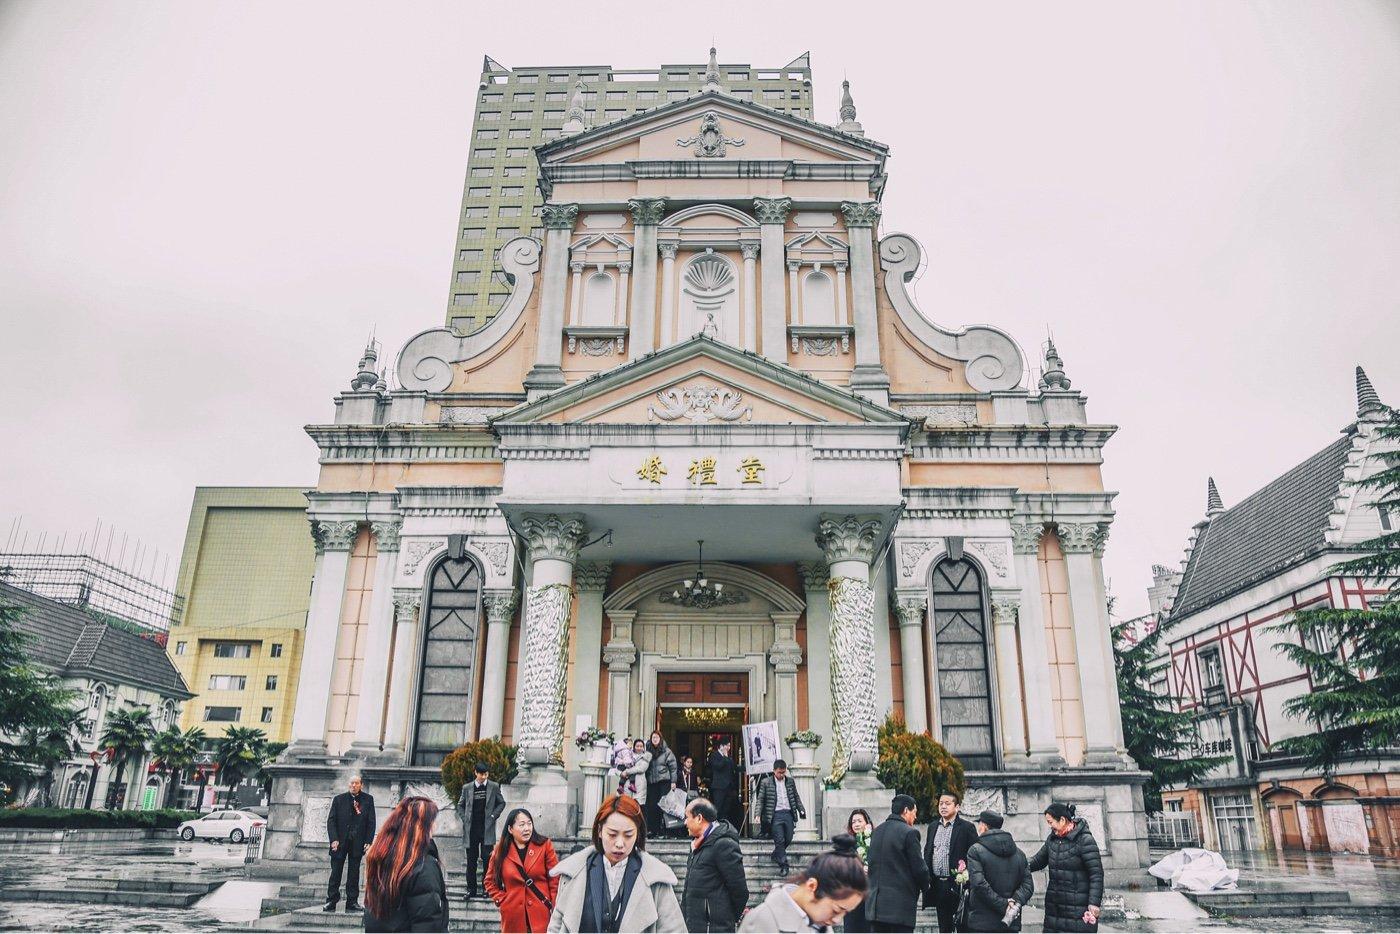 「Fantasy Wedding」&明珠教堂⛪1